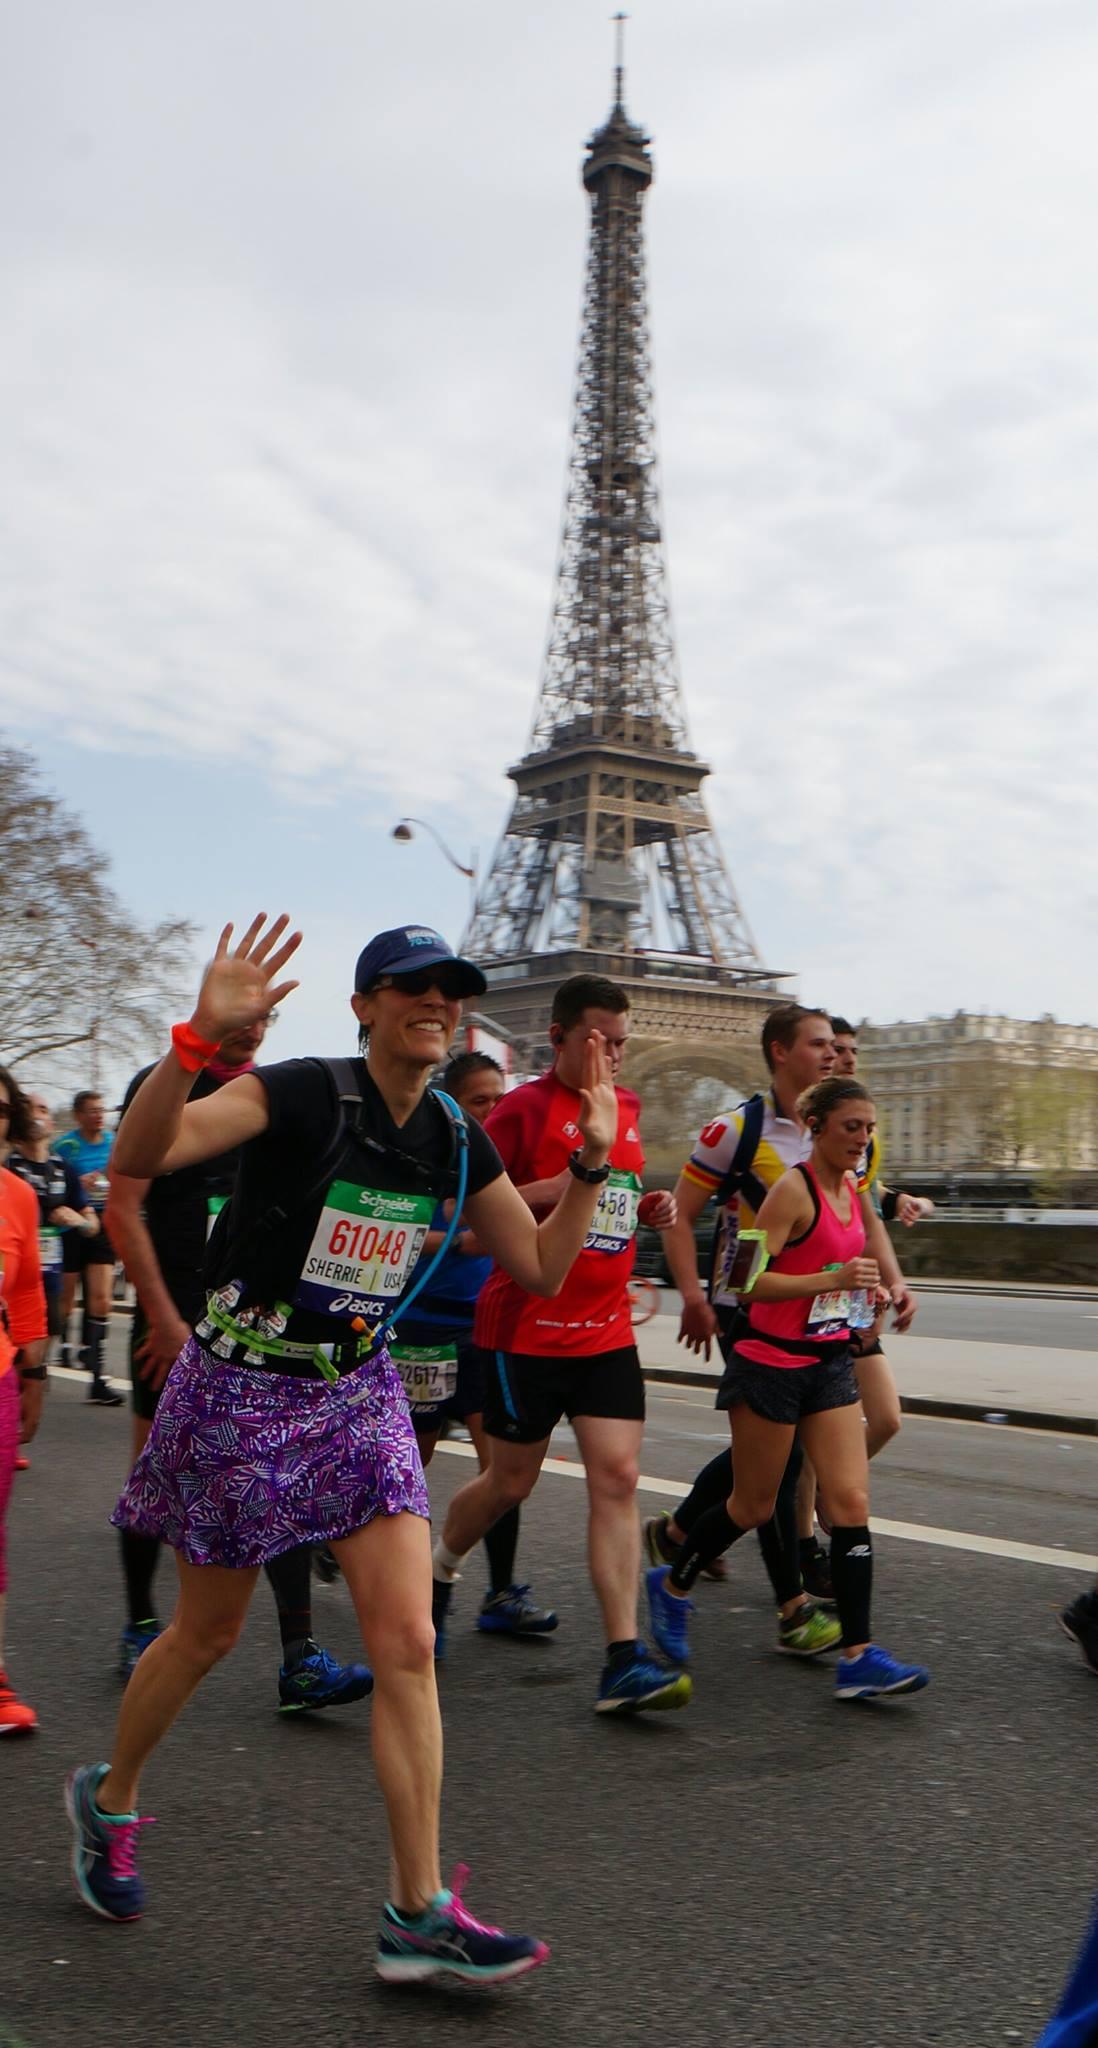 Sherrie Crow runs the Paris Marathon